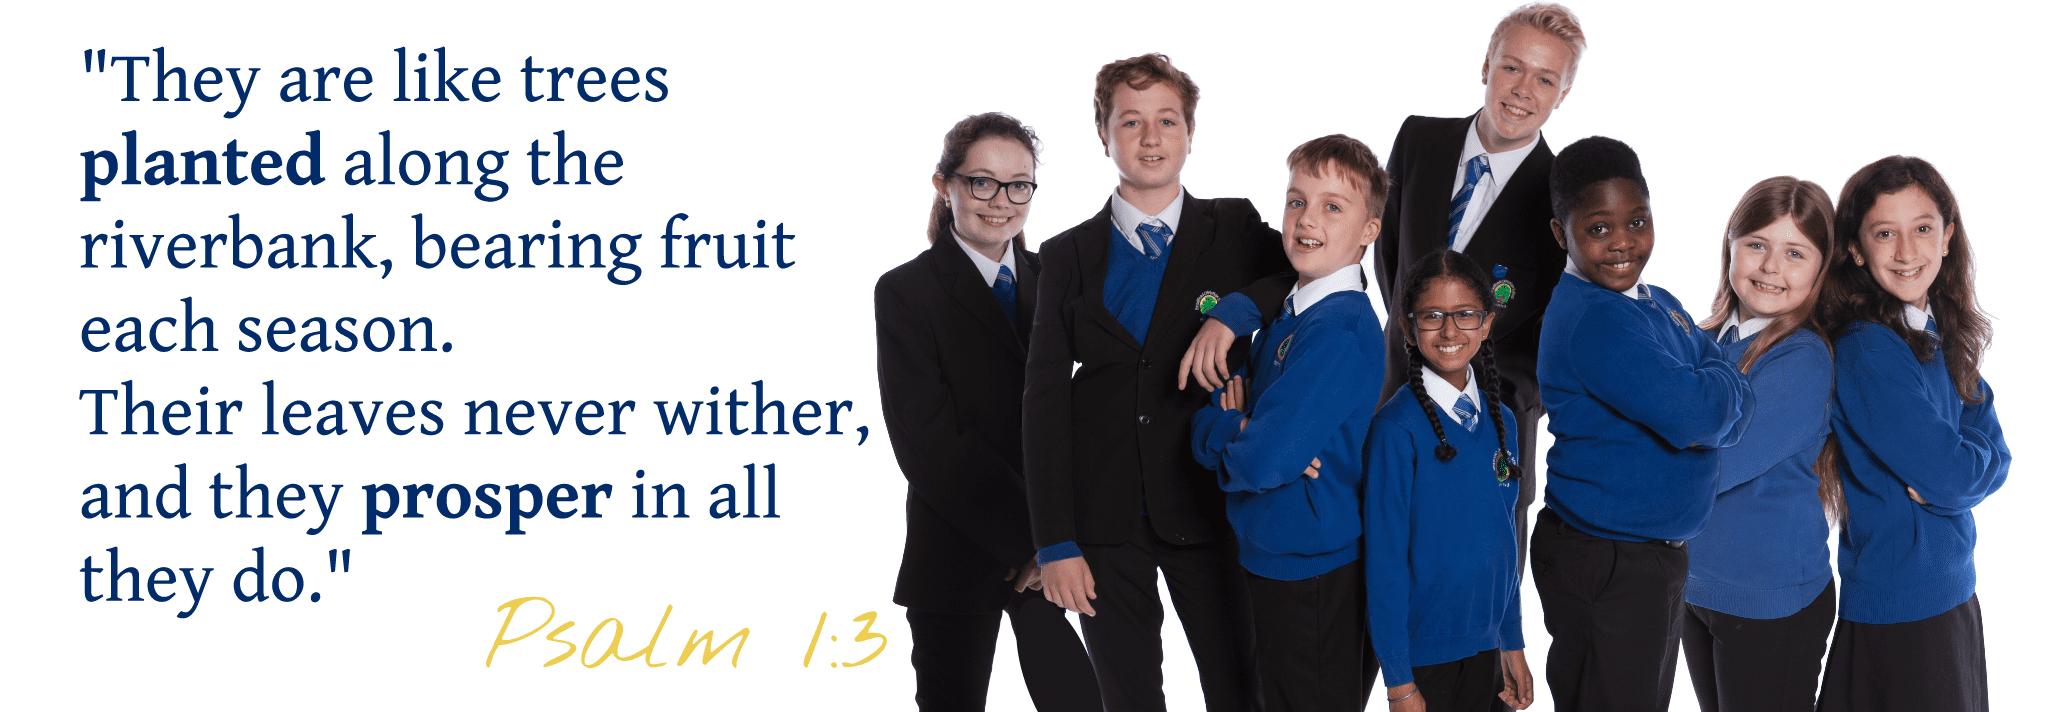 Psalm1_3_Banner (13)